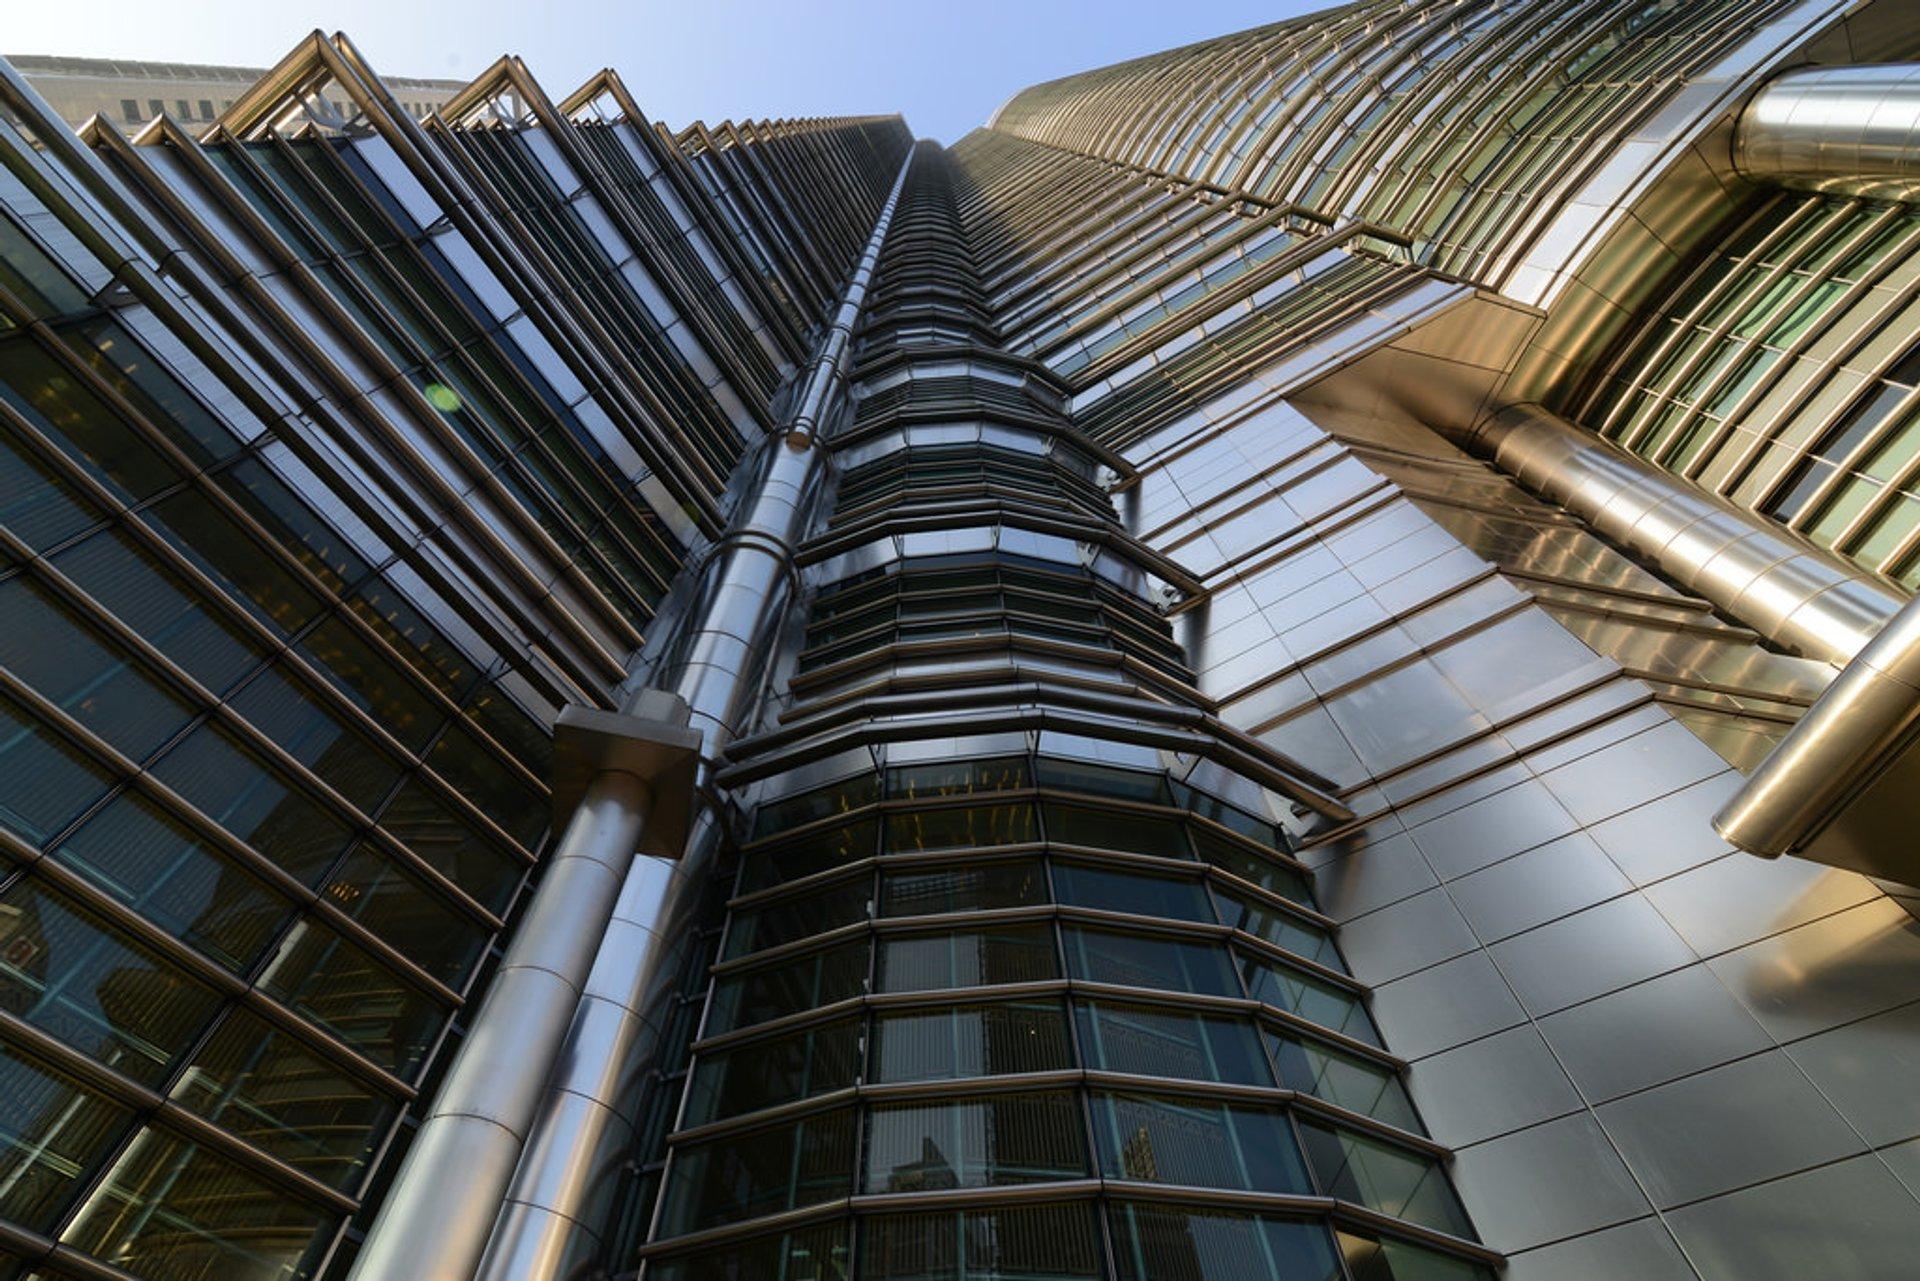 Best time for Petronas Twin Towers in Kuala Lumpur 2019